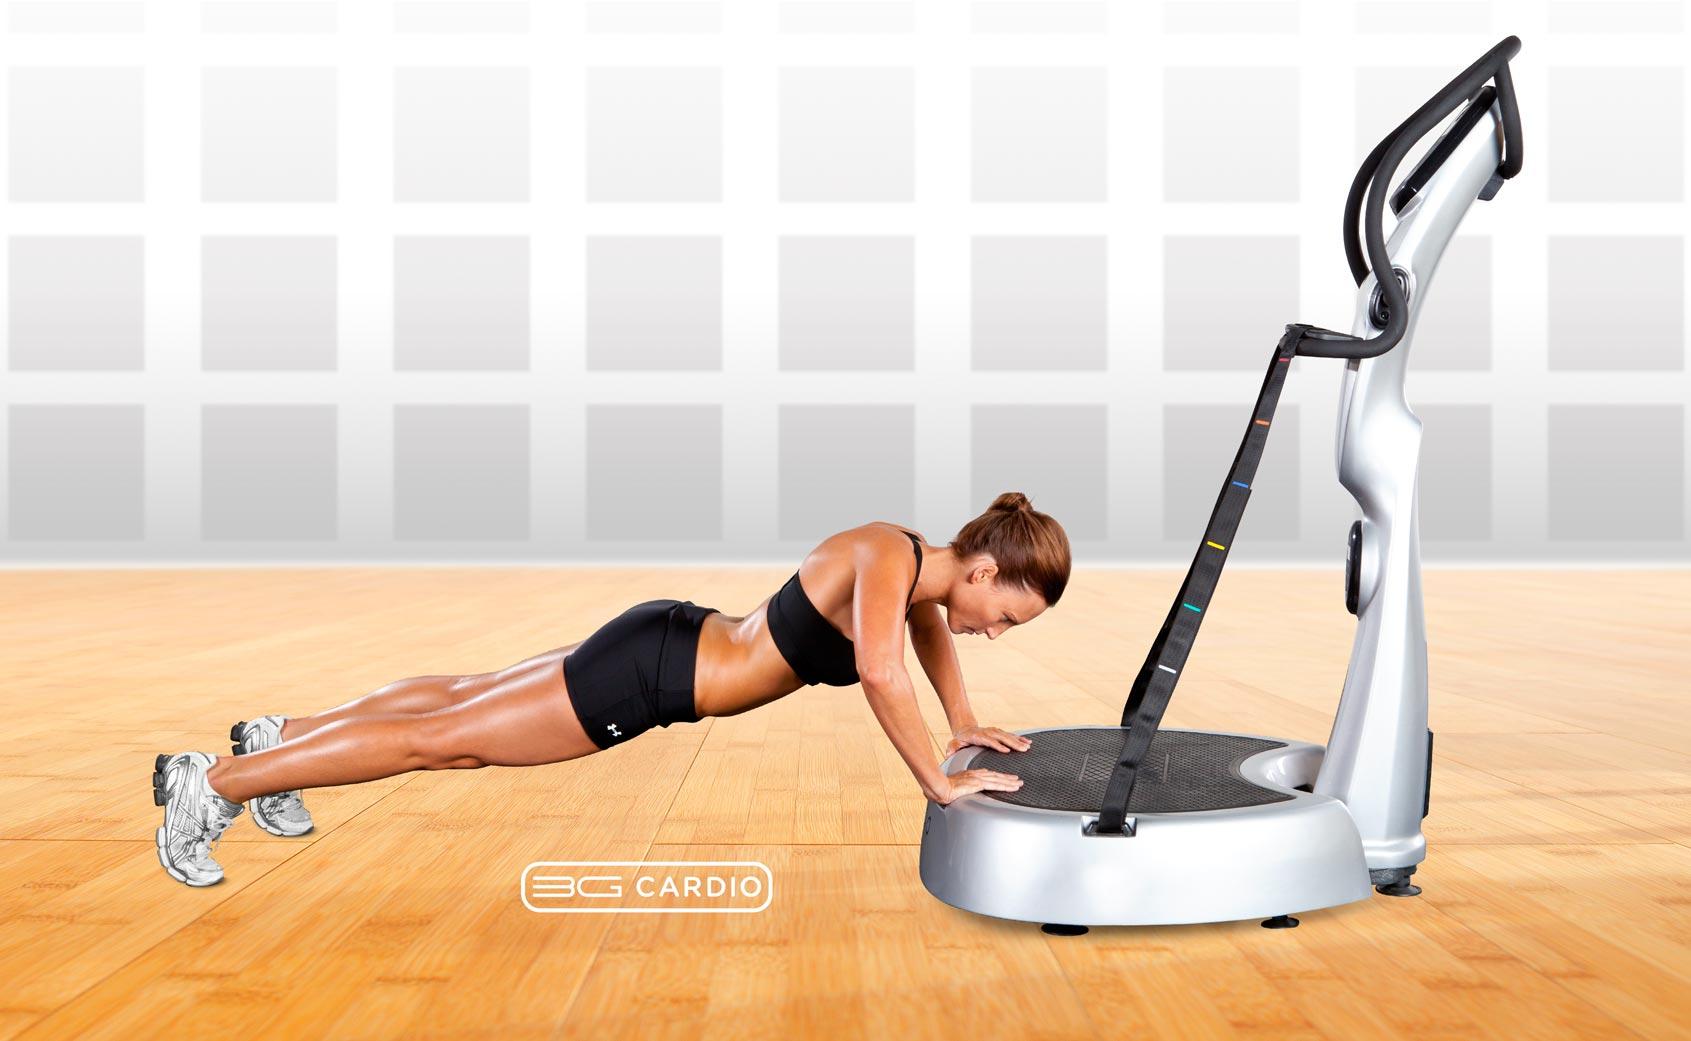 3G Cardio AVT Exercise Tips: Pushups